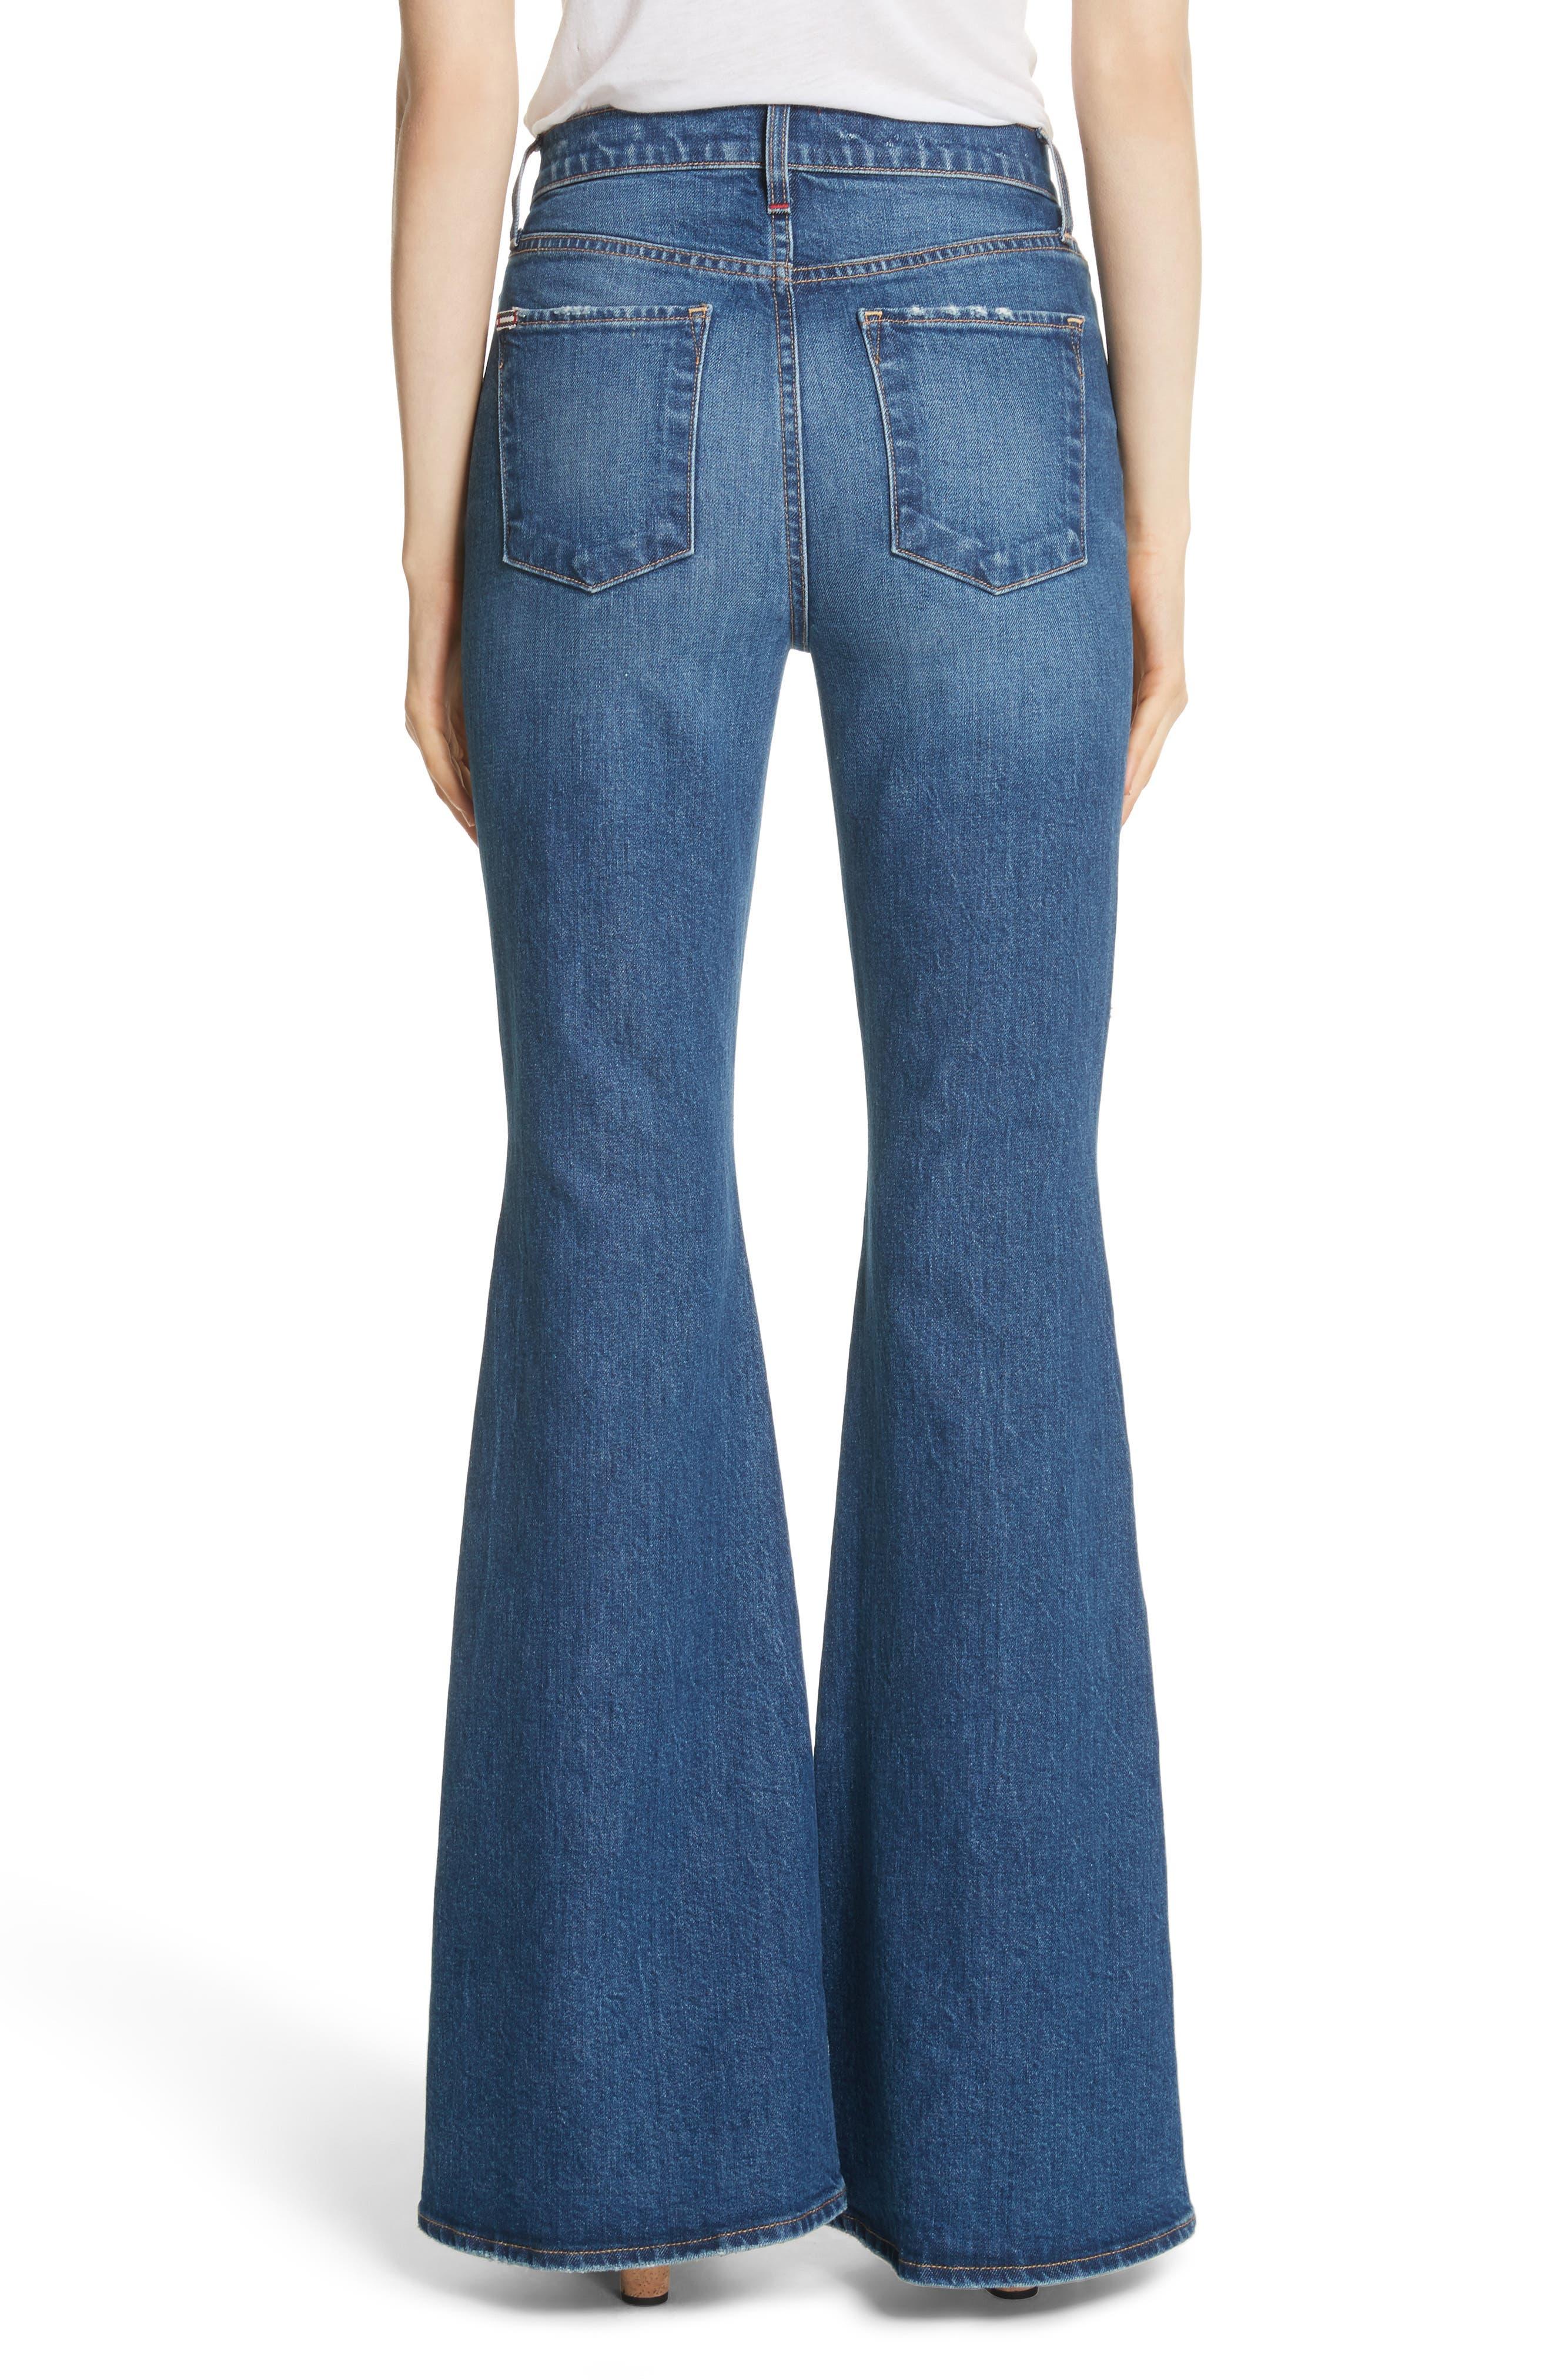 AO.LA Beautiful High Waist Bell Jeans,                             Alternate thumbnail 2, color,                             Secret Meeting